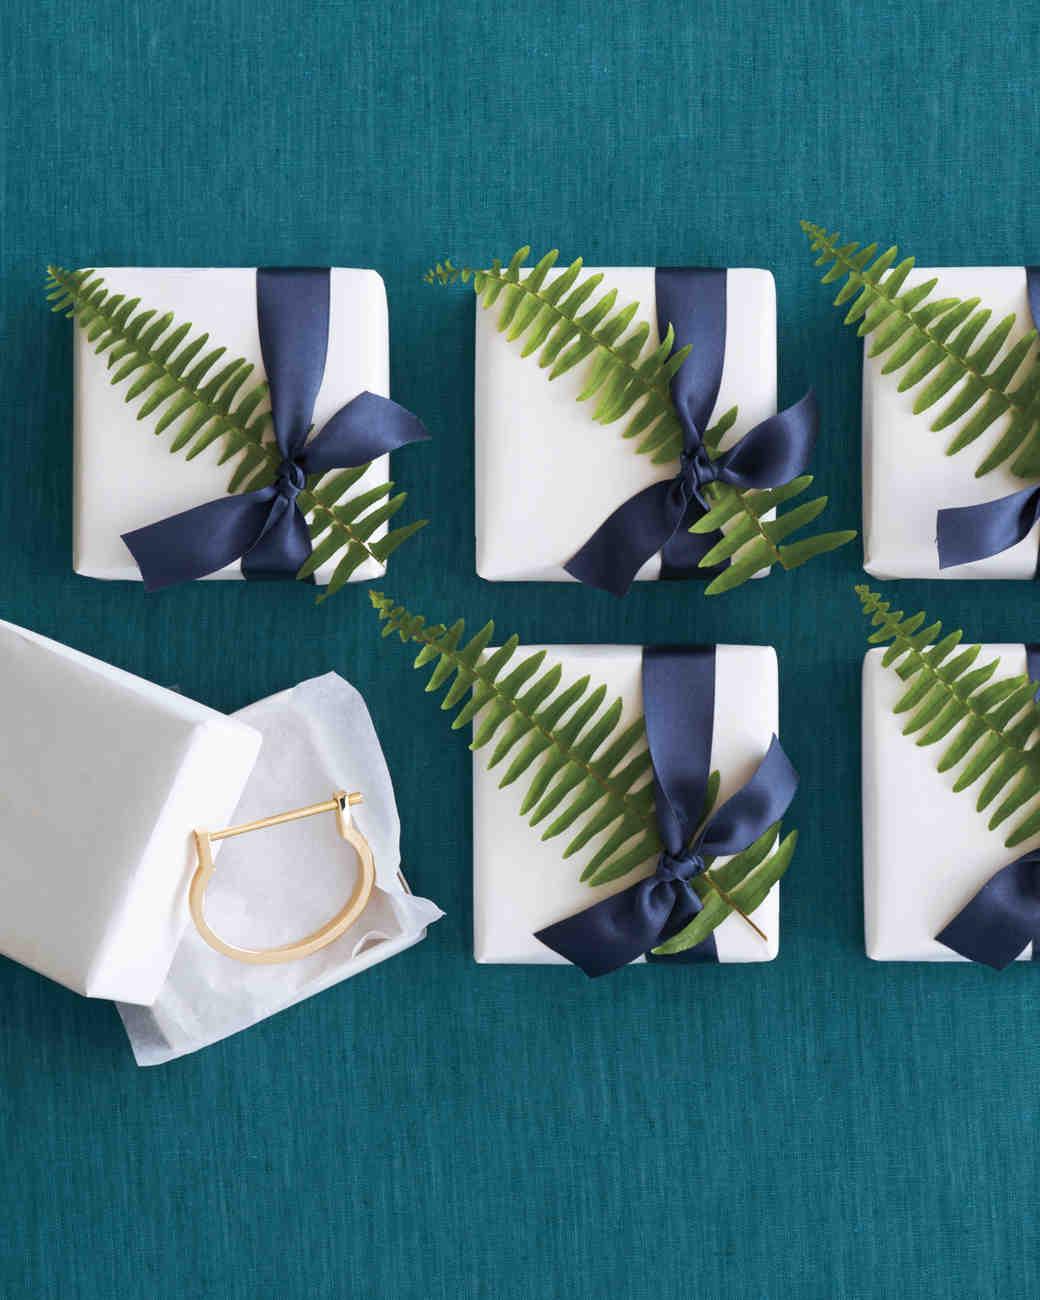 kristina-barrett-wedding-bedford-bridesmaids-gifts-0190-r-d112650.jpg